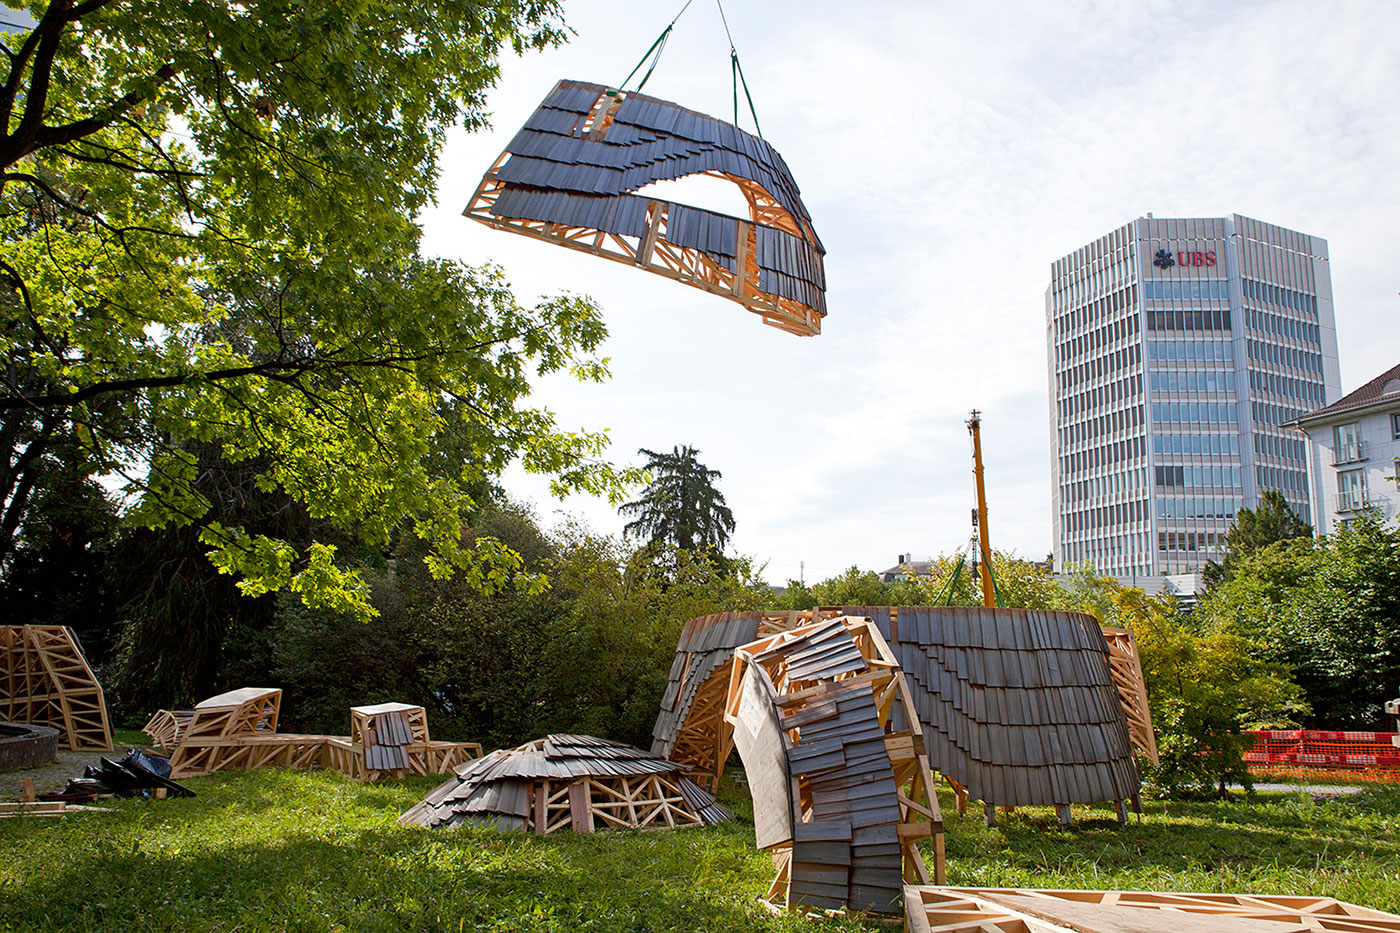 Design Biennale Zürich 2017, Robotic Pavilion, ETH, Gramazio Kohler Research (Foto: Lukas Beyeler)